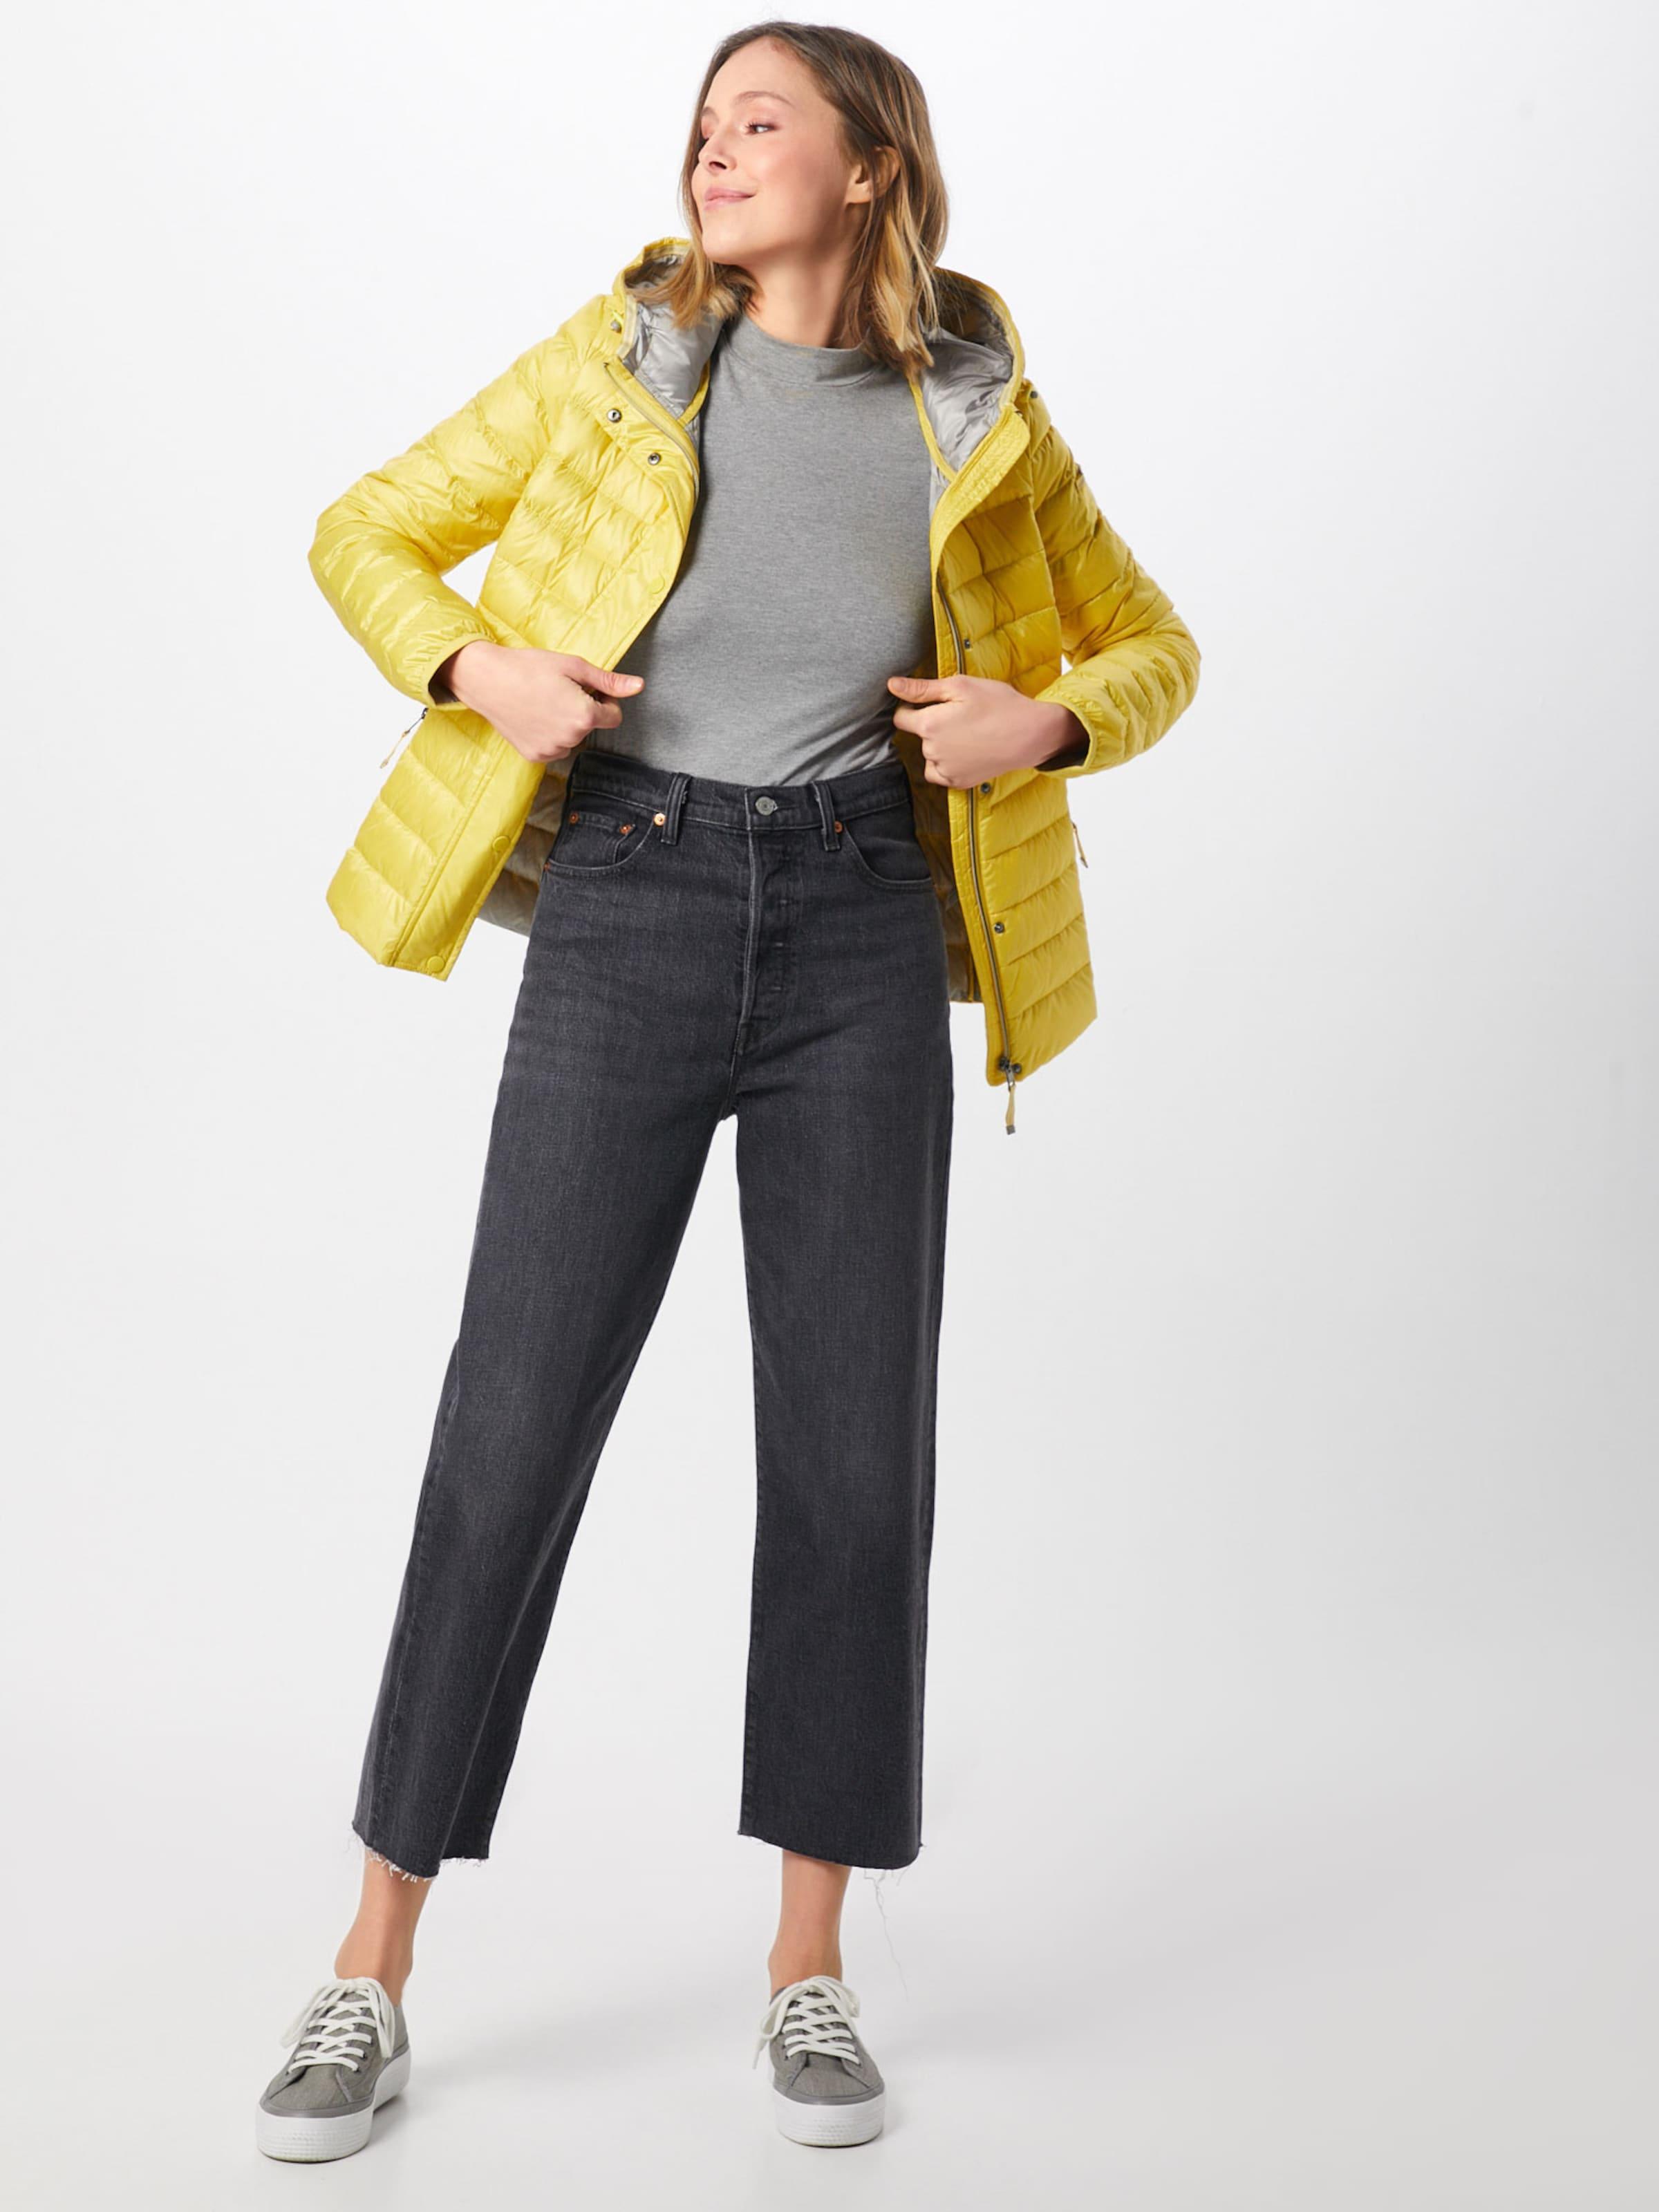 Npw08okx In Jacke Gelb Gelb Esprit Jacke In Esprit Npw08okx pSqzjVLUMG